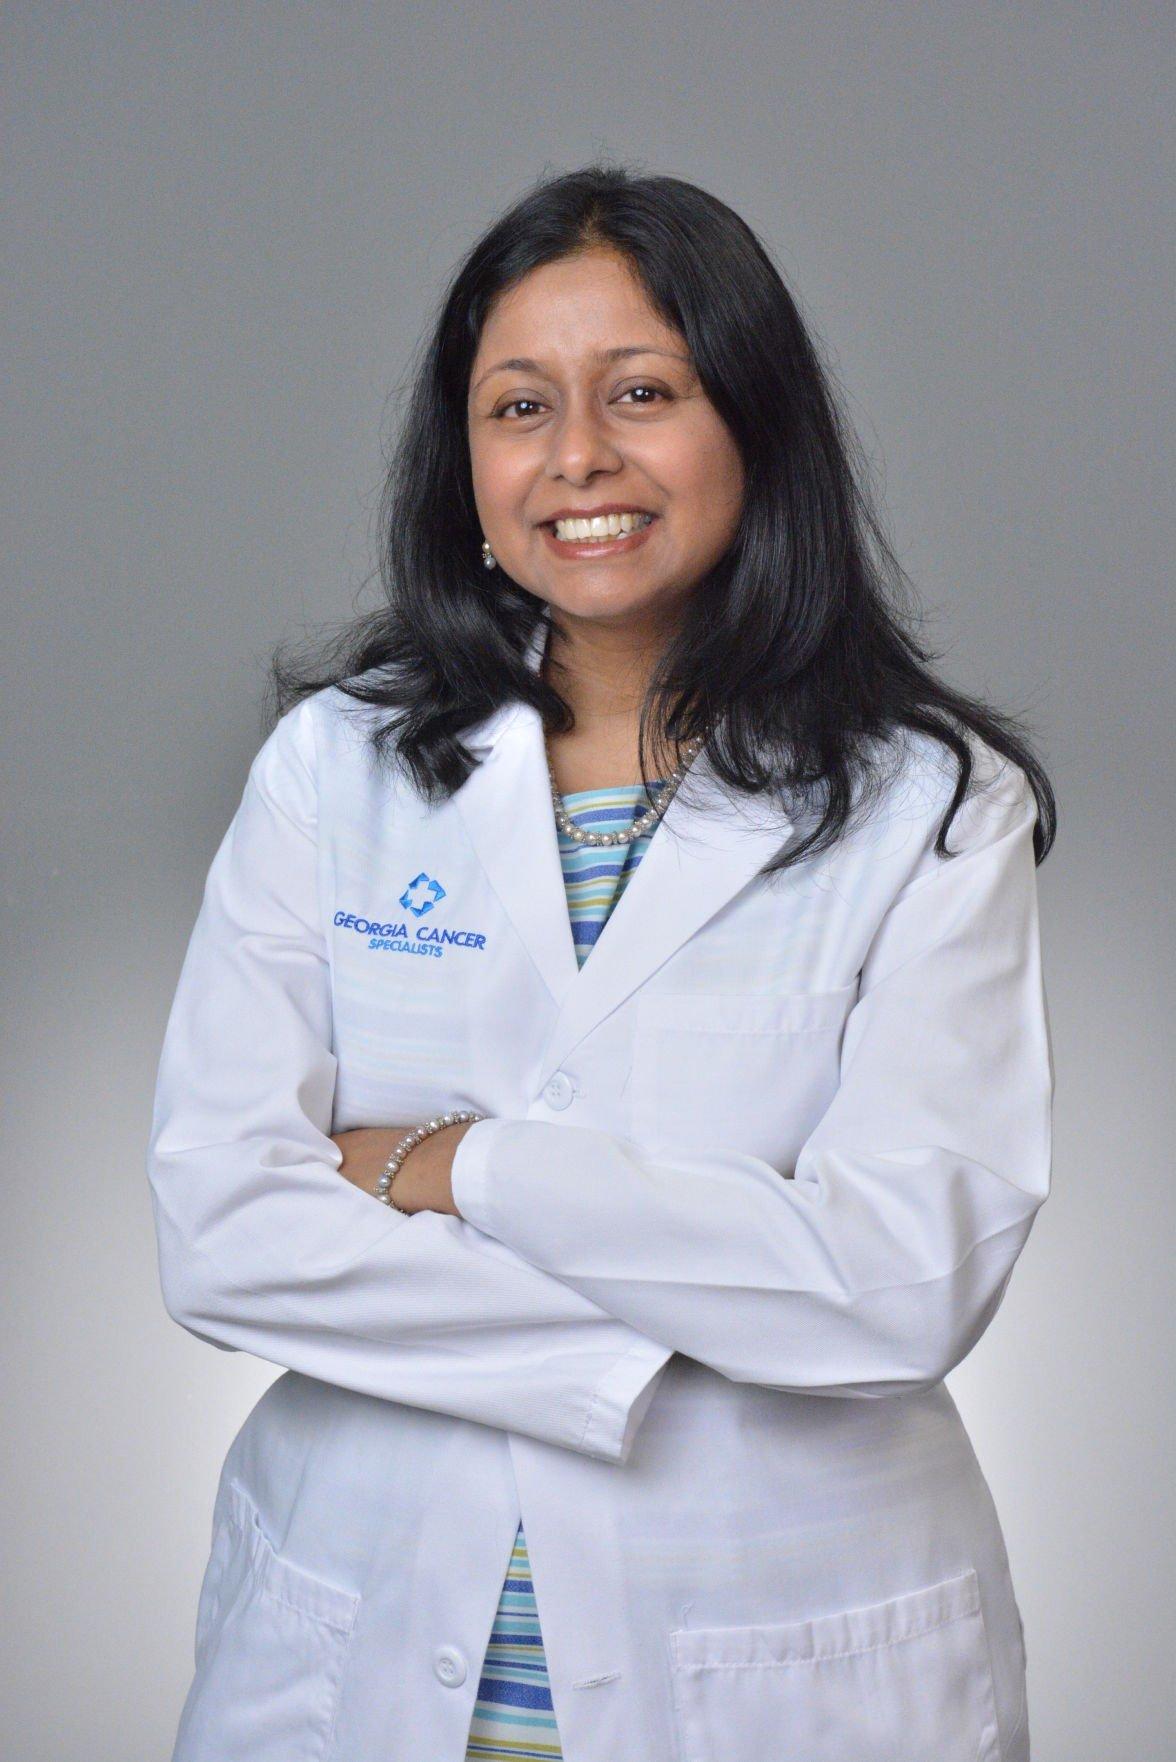 Cancer Specialist Of Georgia